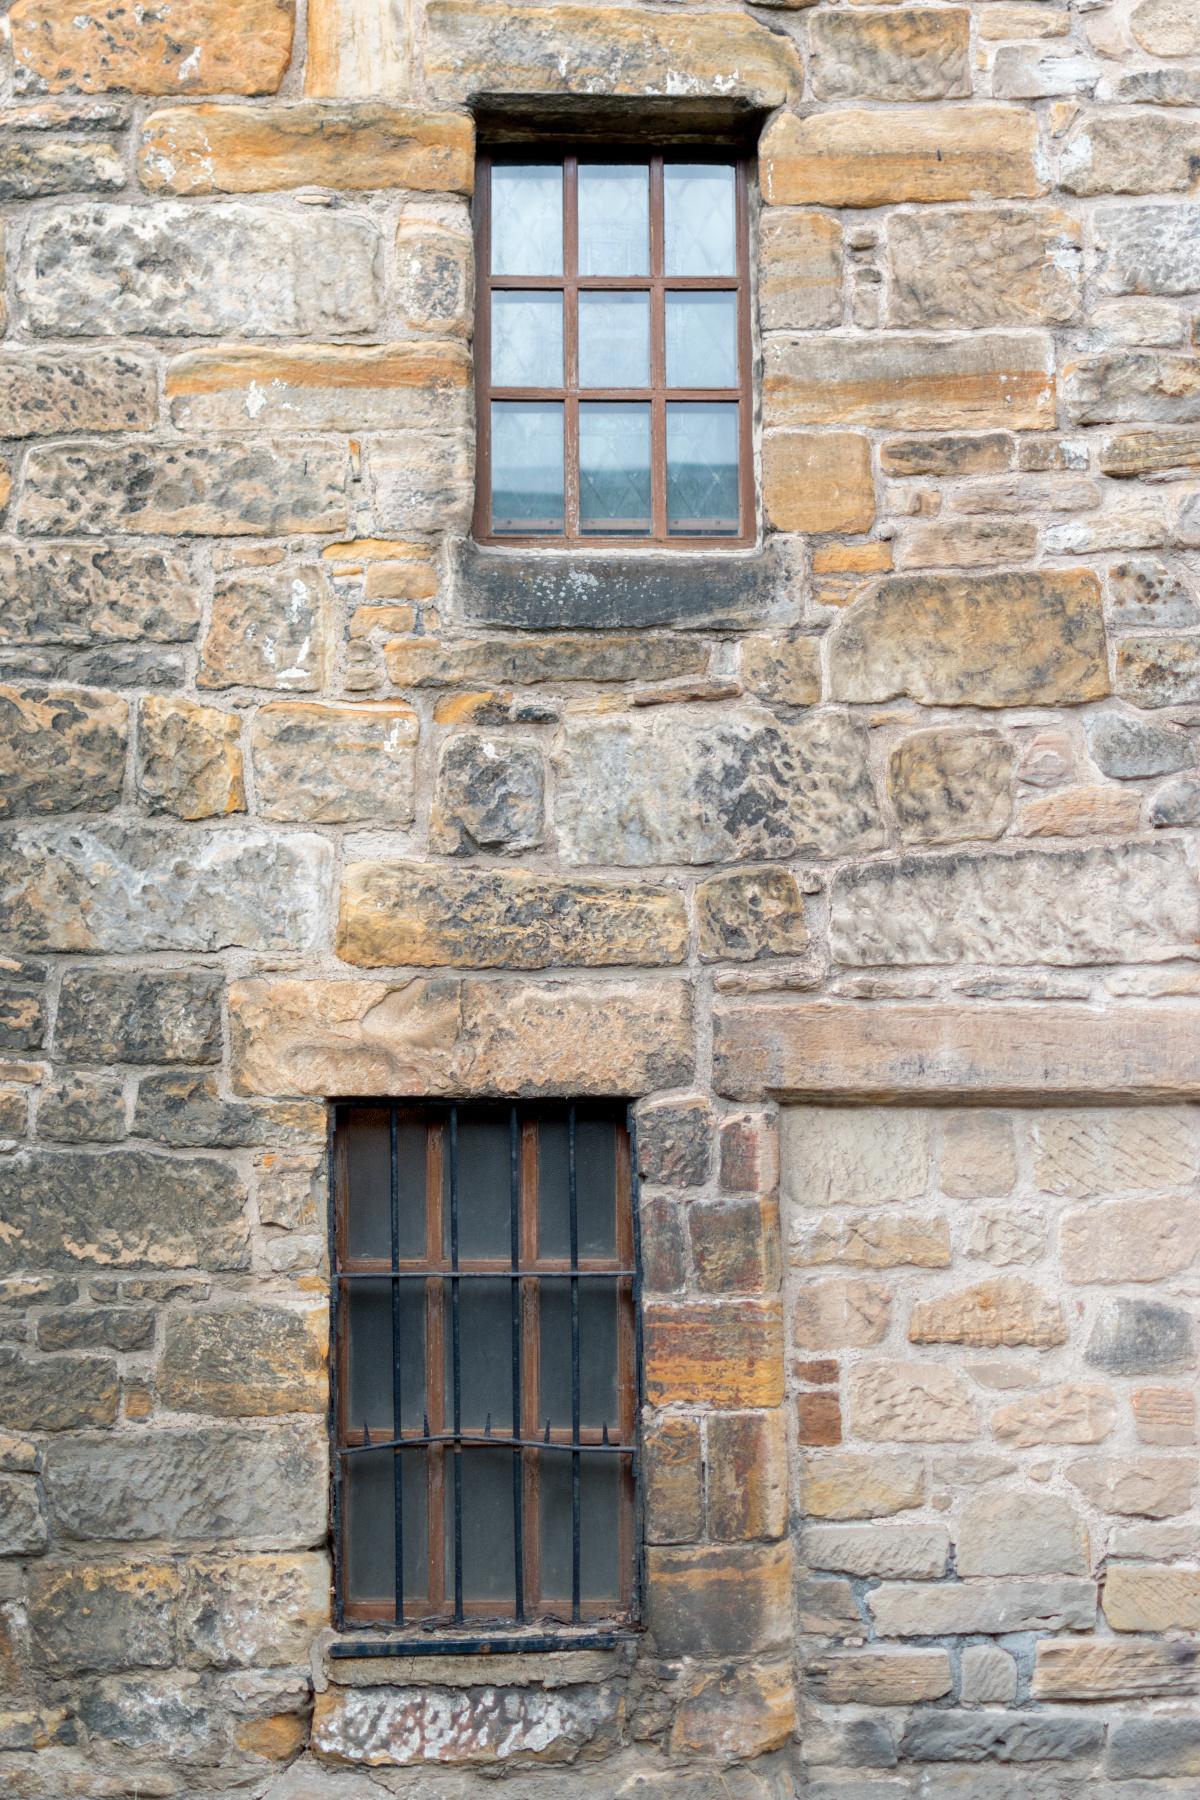 The Oldest Windows in Glasgow